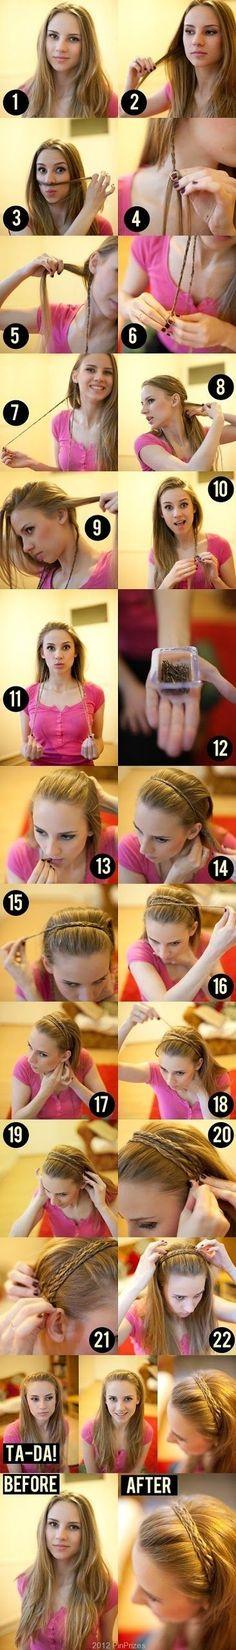 DIY Braid Headband diy easy diy diy beauty diy hair diy fashion beauty diy diy style diy hair style